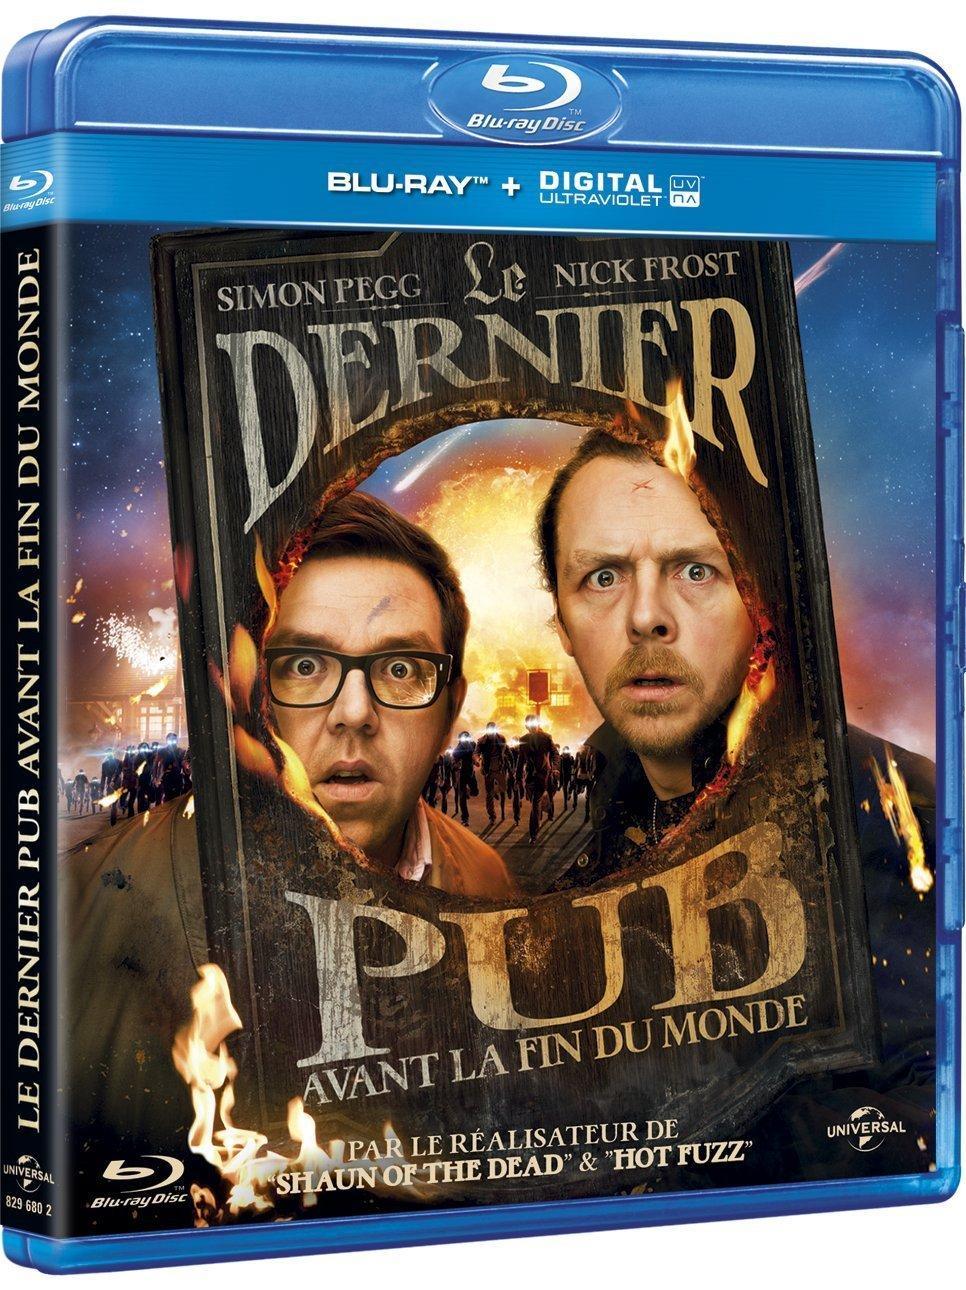 Blu-ray Le Dernier pub avant la fin du monde